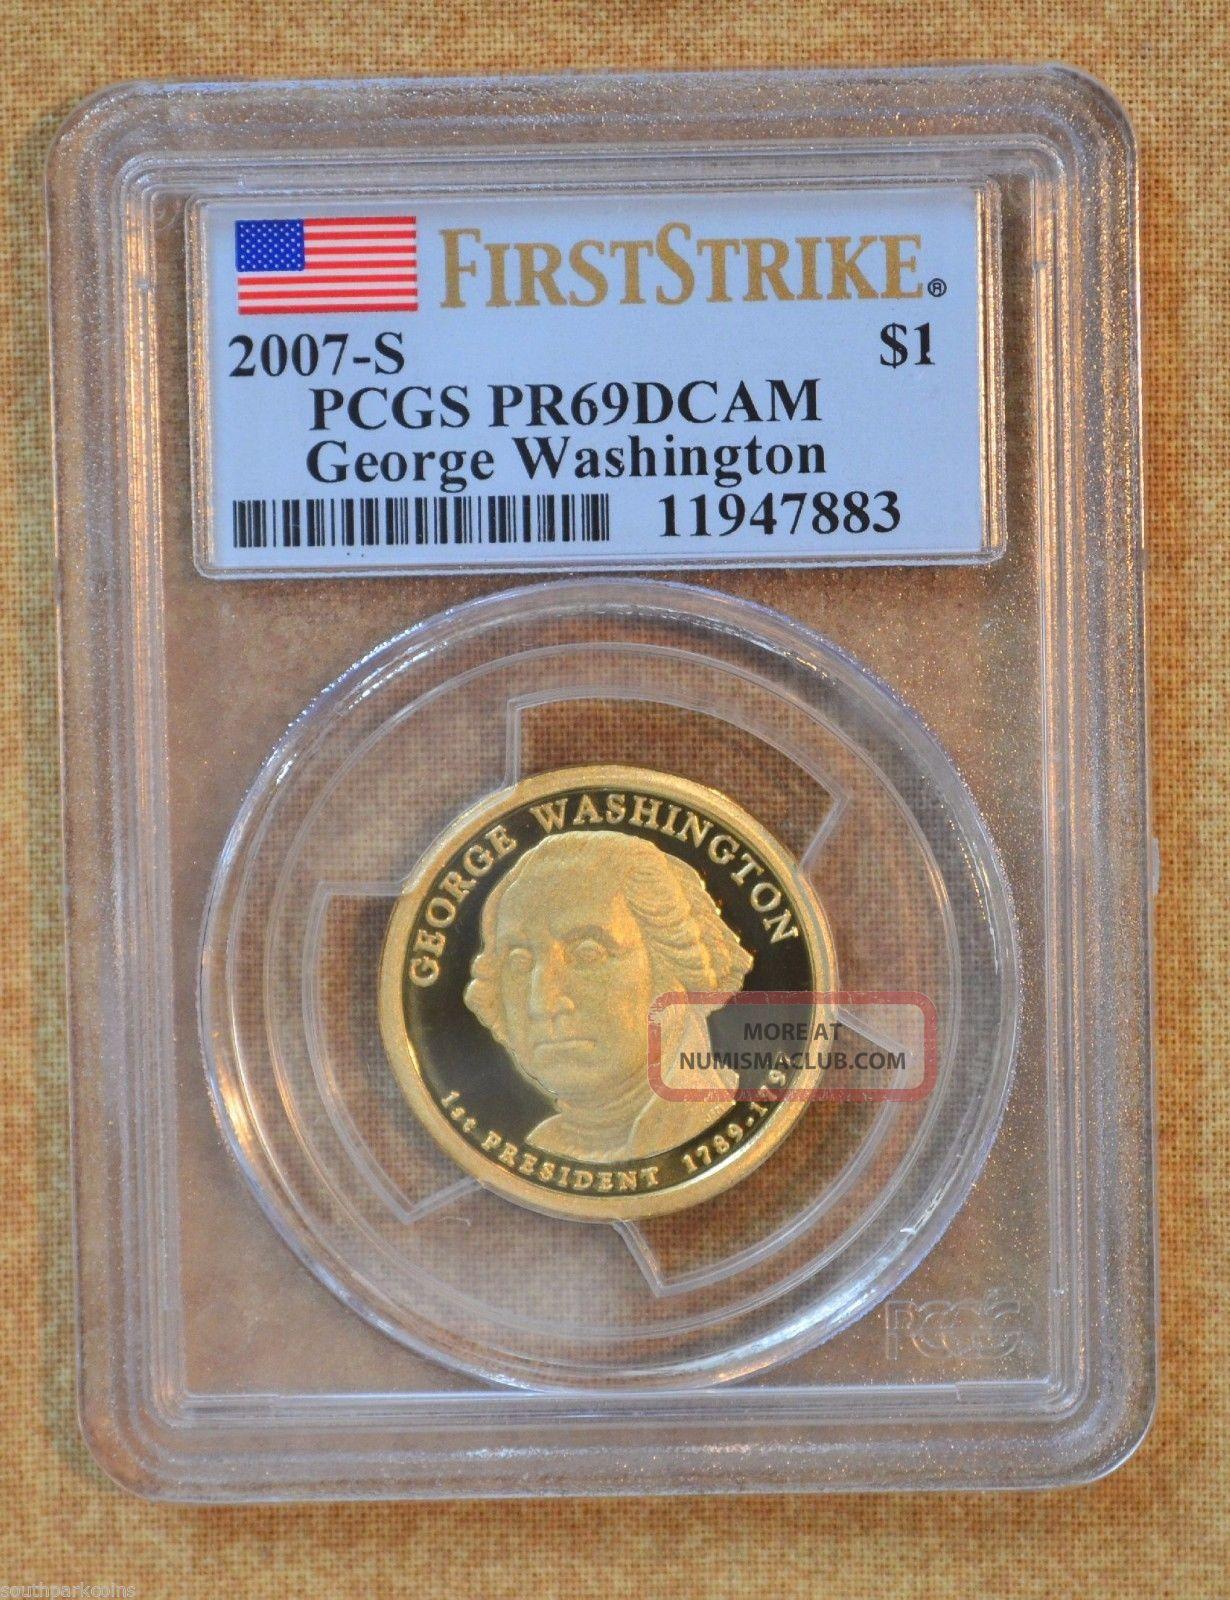 2007 - S First Strike G.  W.  Presidential Dollar - Pcgs Slabbed Pr69dcam Dollars photo